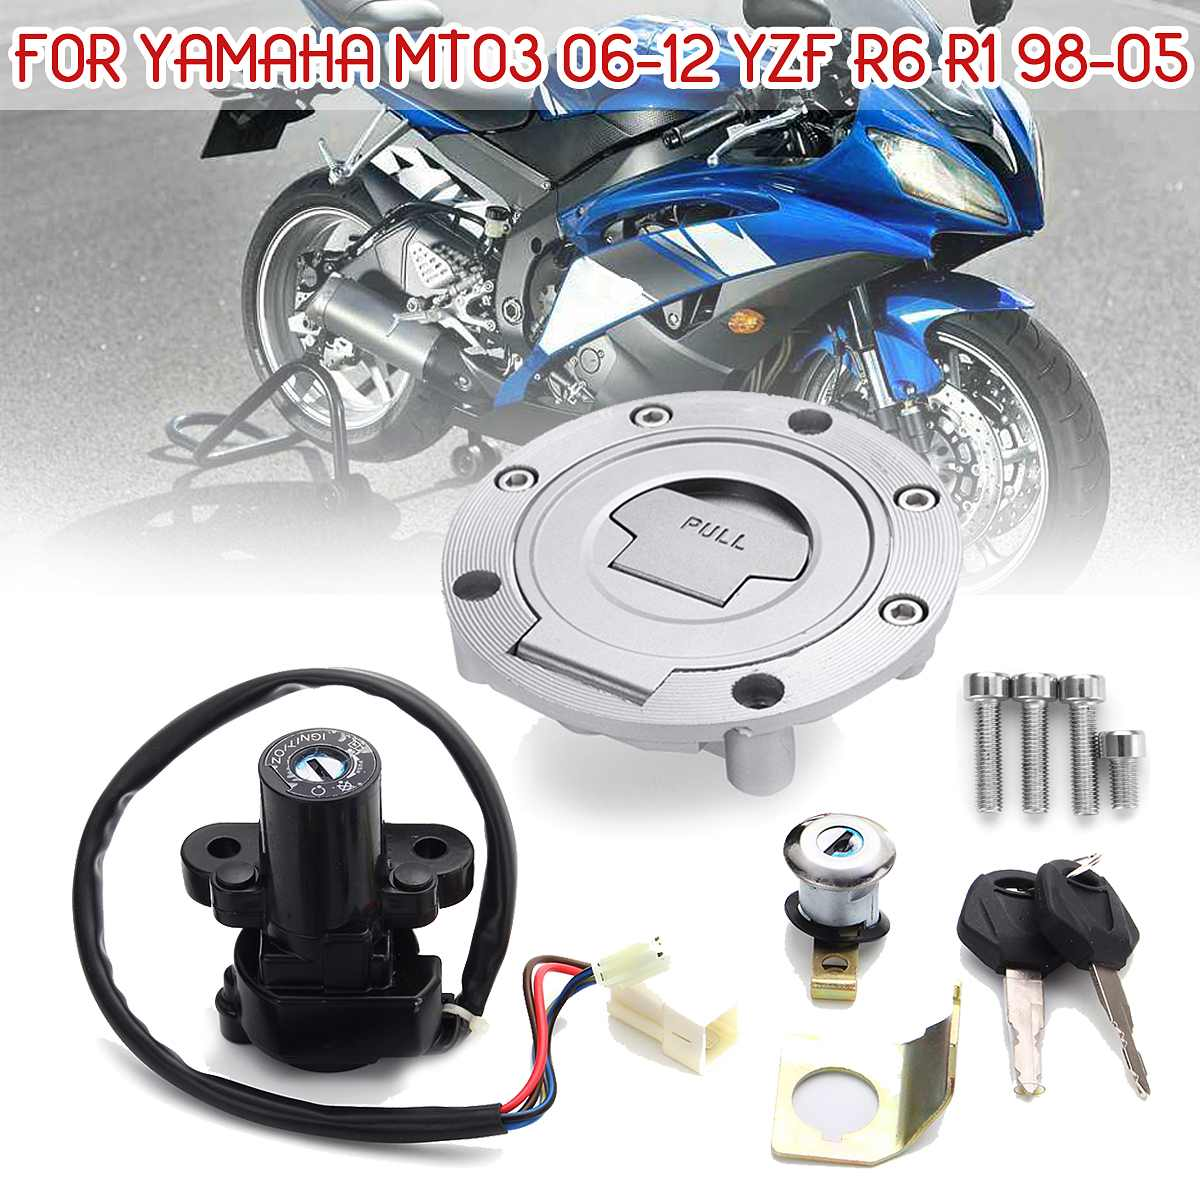 Zündschloss Sperren Fuel Gas Cap Key Set Für Yamaha MT03 06-12 YZF R6 R1 XJ6 FJ09 FZ09 FZ07 FJ13 FZ1 FZ6 FZ8